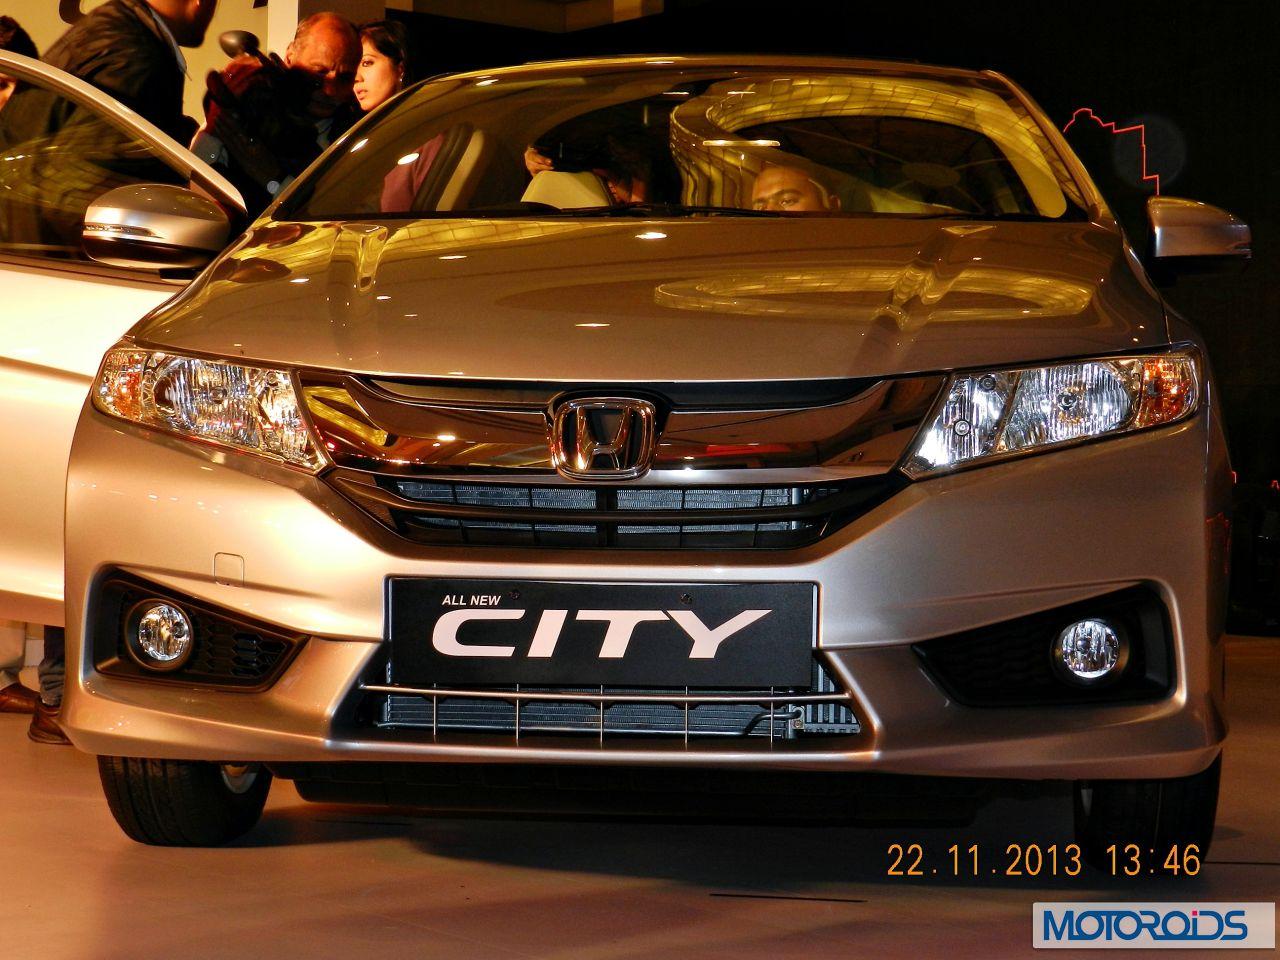 Picture Of Upcoming Honda City 2014 In India | Autos Weblog